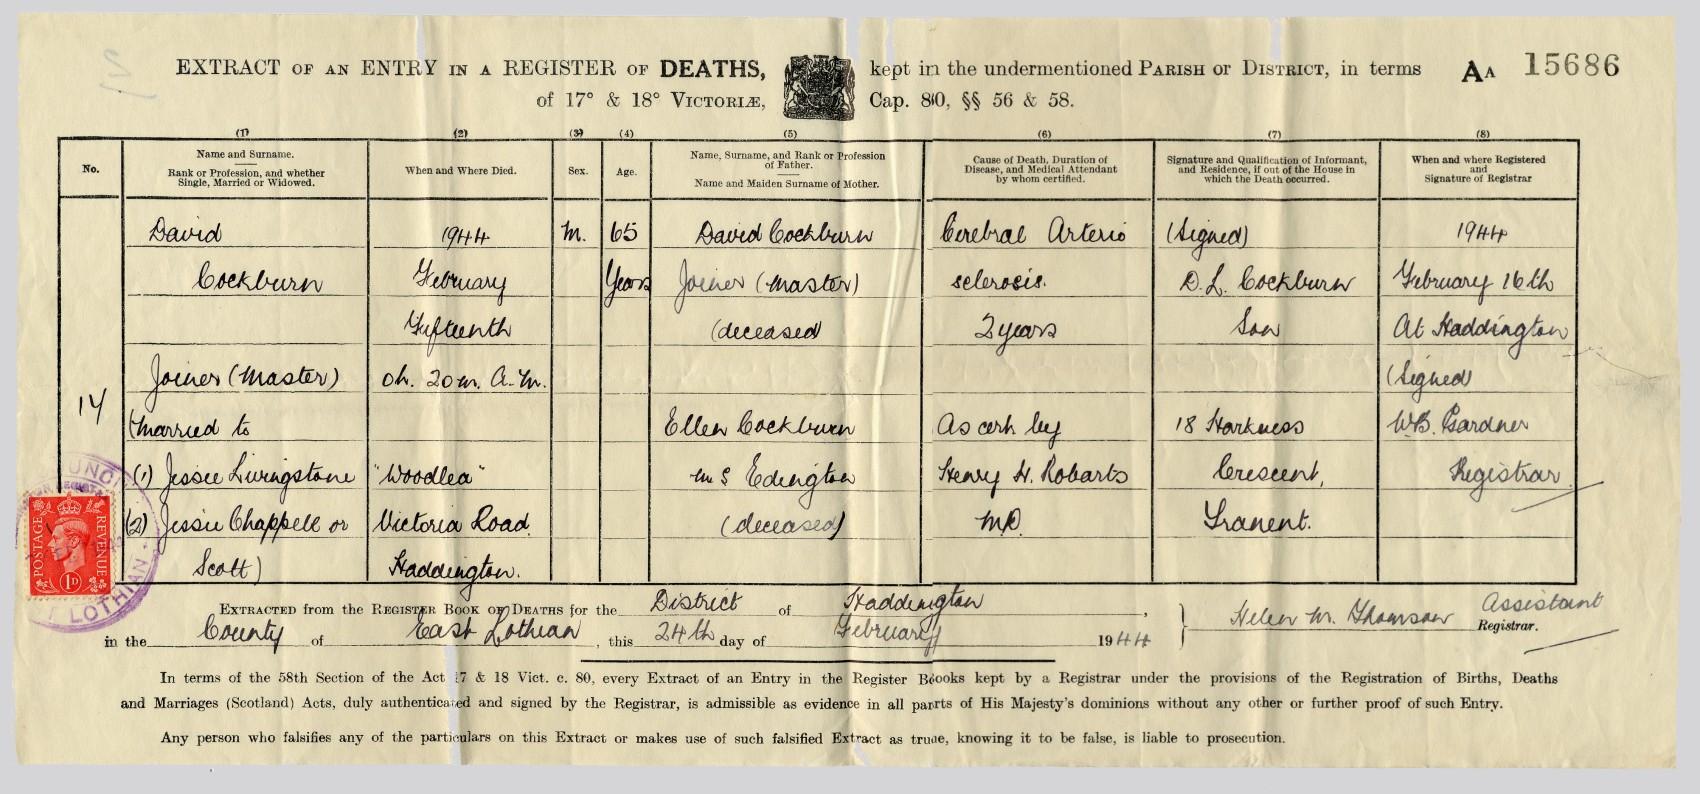 Cockburn family tree genealogy in scotland david cockburn junior master joiner haddington birth certificate 1878 aiddatafo Image collections